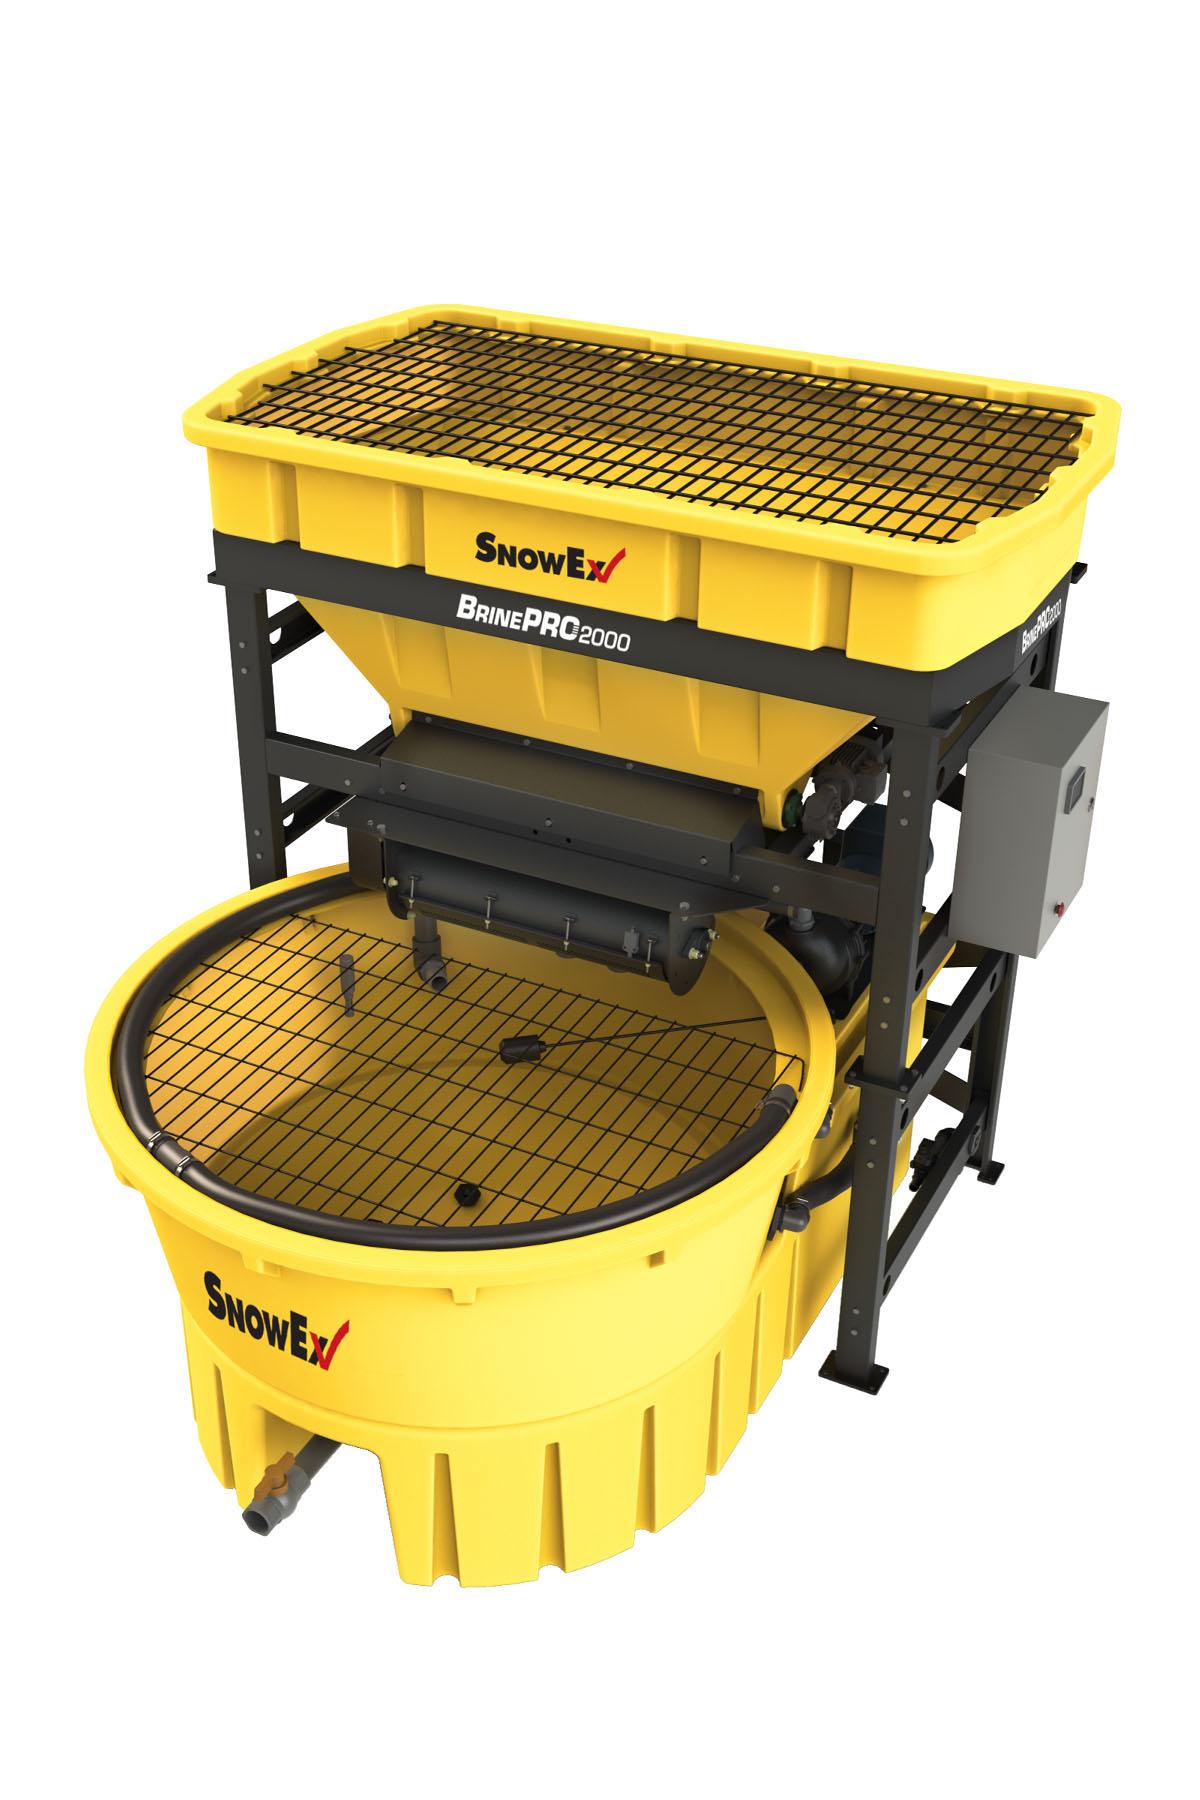 SnowEx BP-2000 brine maker